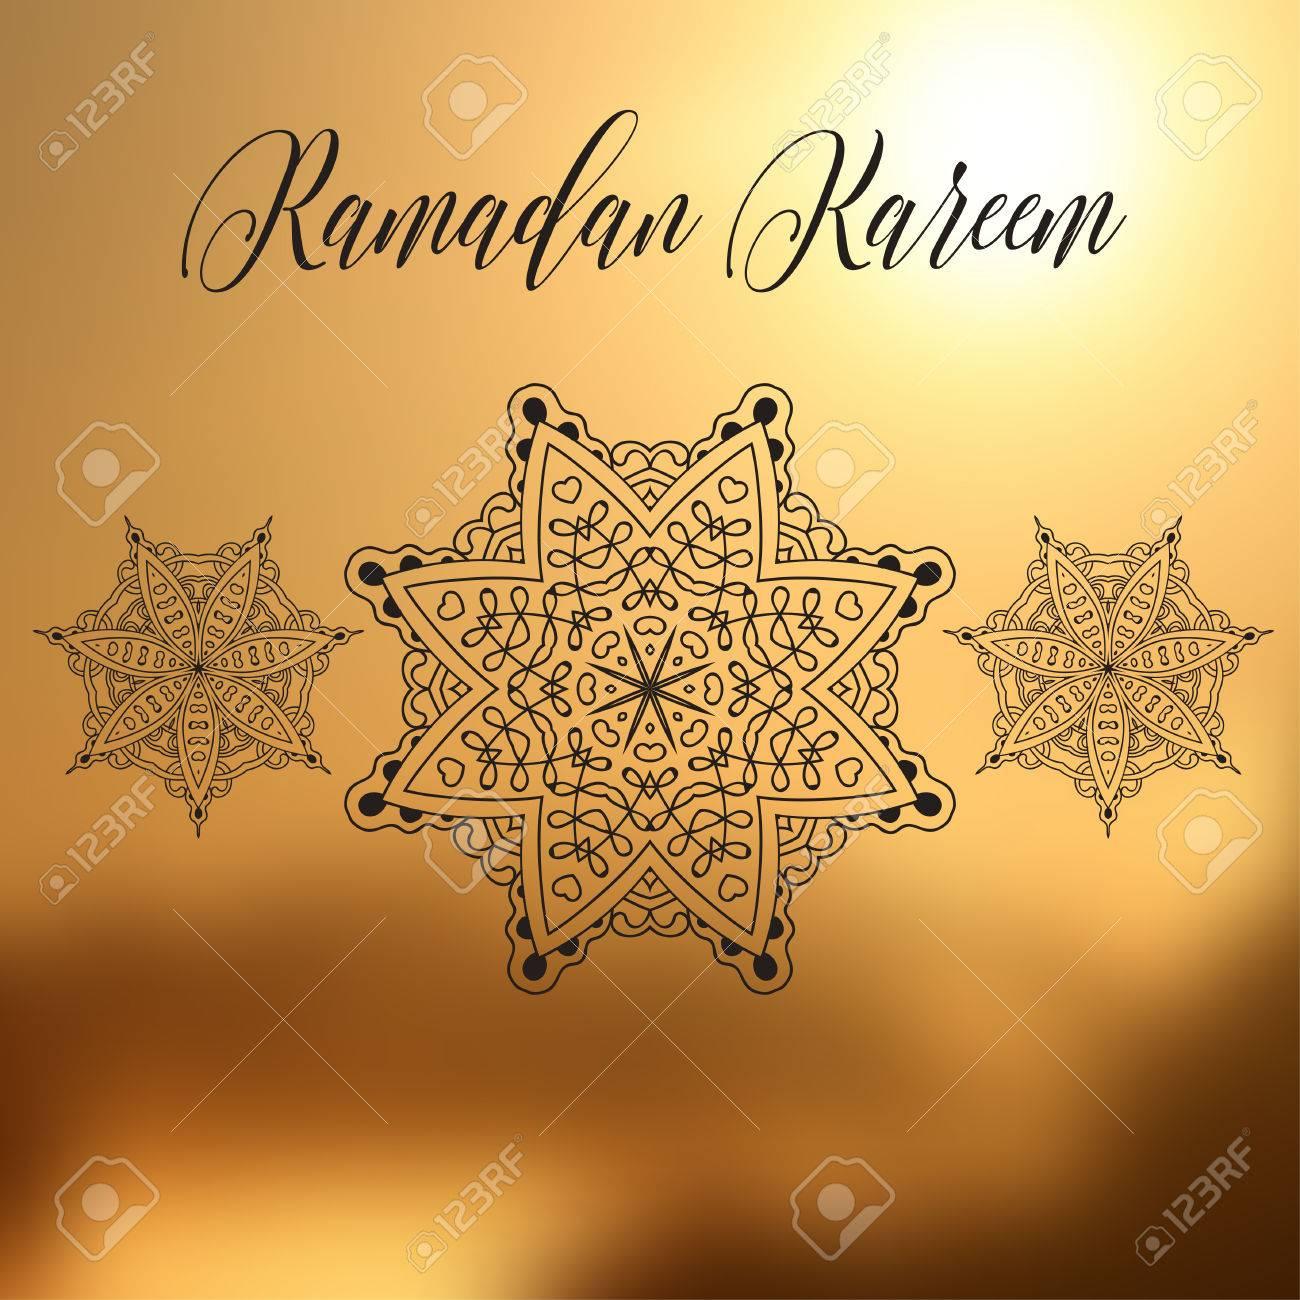 Ramadan kareem background with ornamental mandala greeting vector oriental illustration ramadan kareem background with ornamental mandala greeting card invitation for muslim community holy month stopboris Choice Image